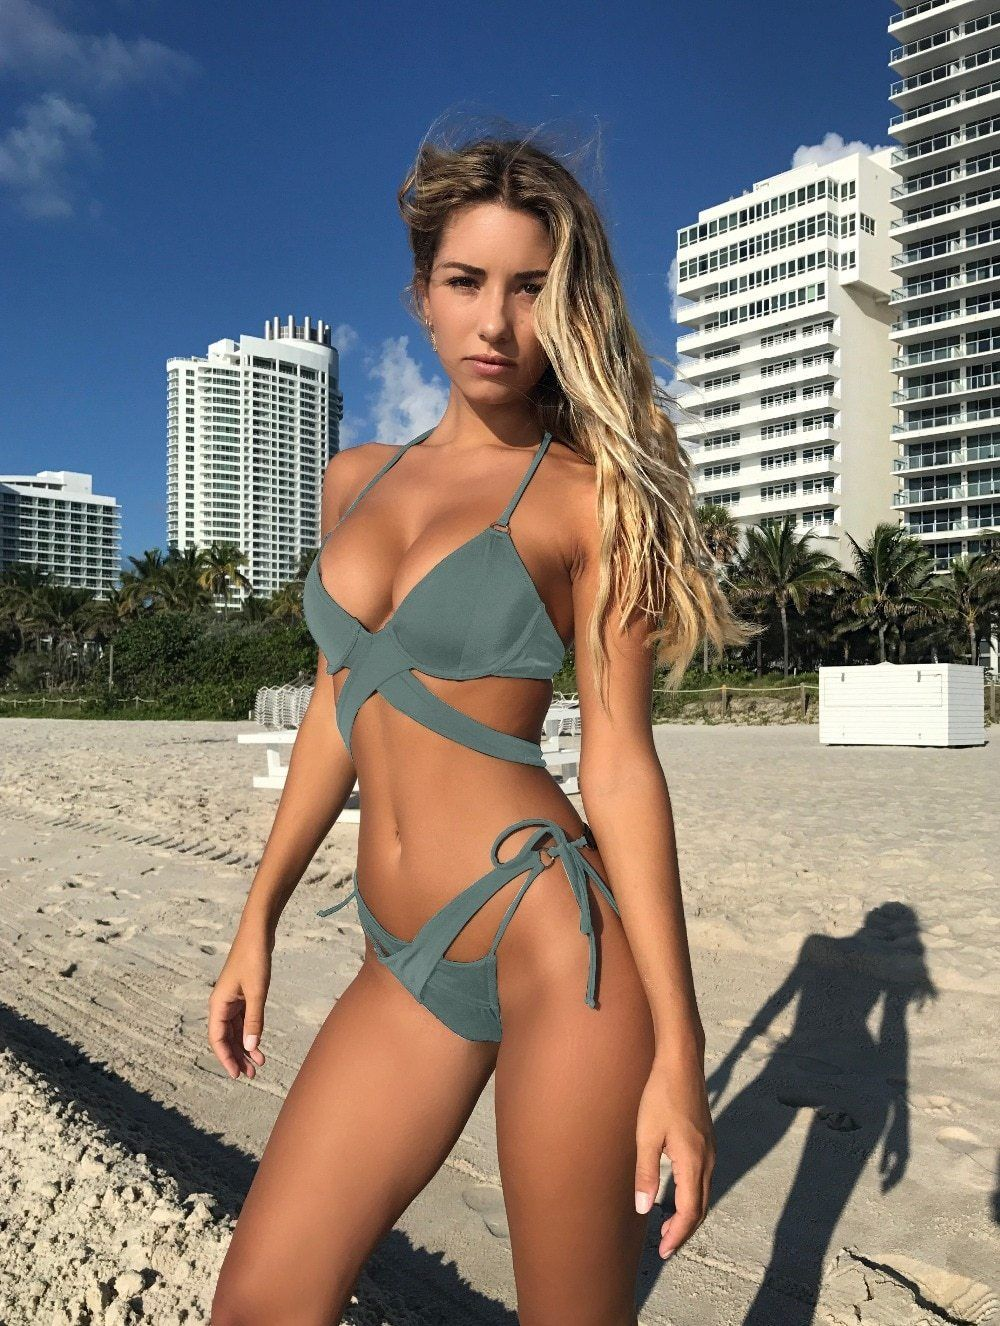 68bbac9a2ec7 Horny Bikini 2019 Swimwear Girls Swimsuit Push Up Bandage design Halter Low  Waist Brazilian Bikini Biquini Beneath Wire With Pad